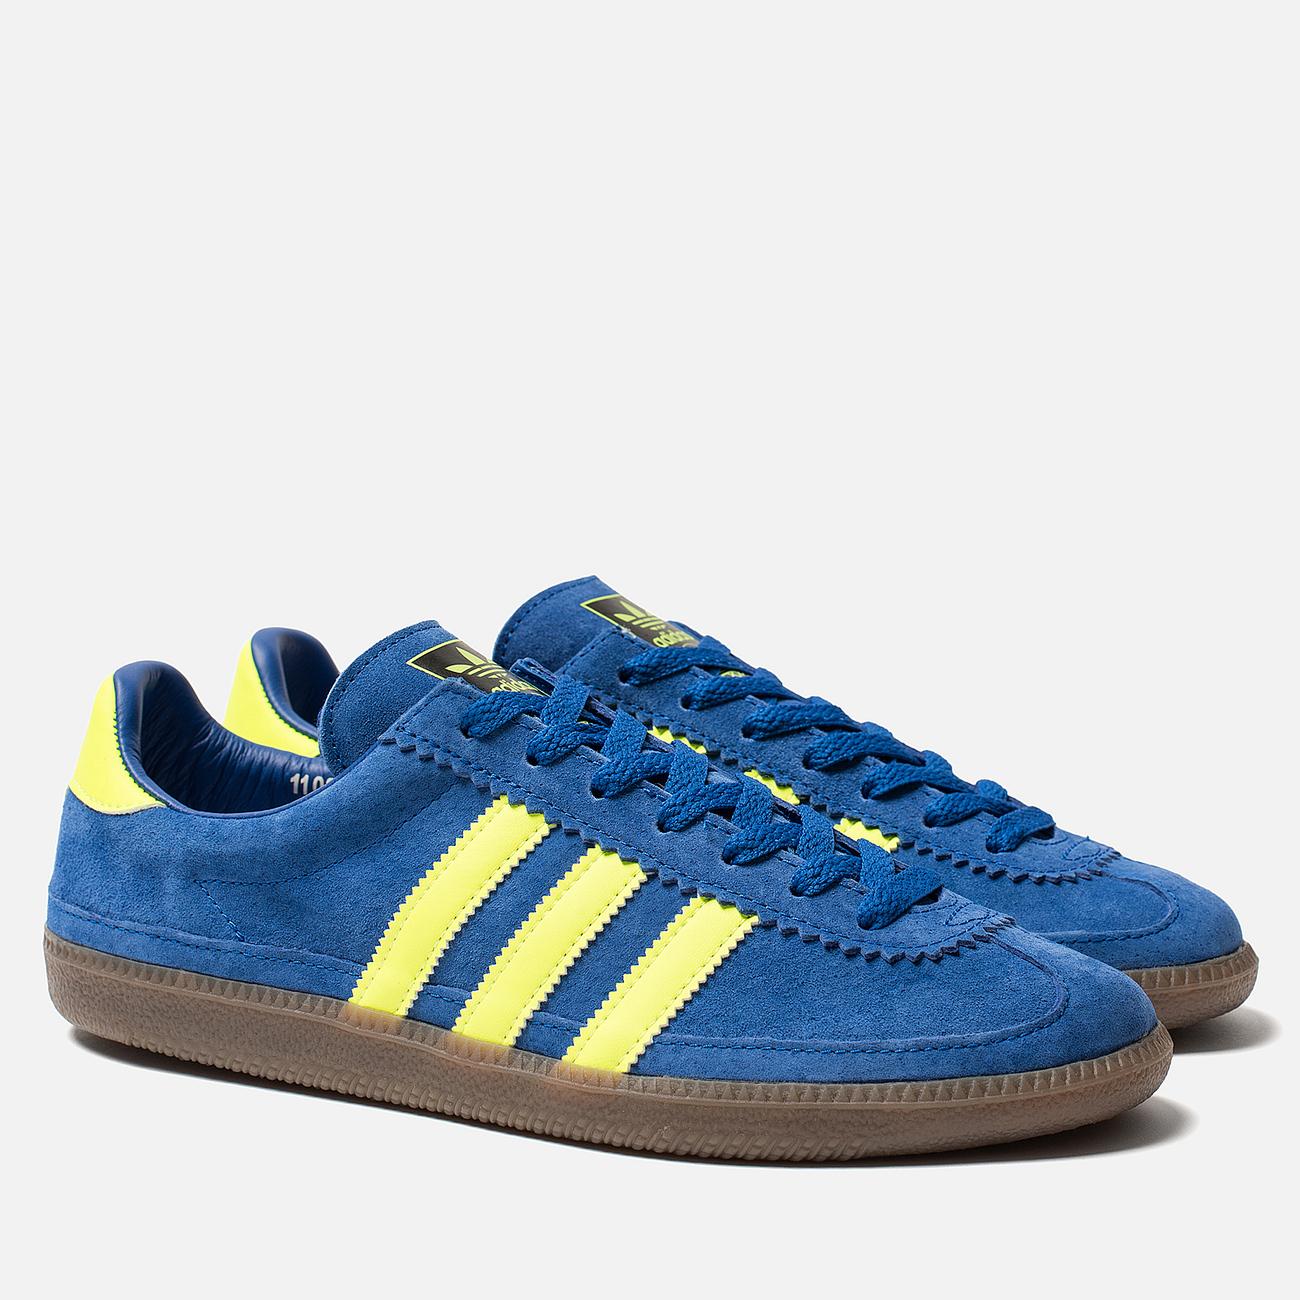 Мужские кроссовки adidas Spezial Whalley Power Blue/Solar Yellow/Cream White